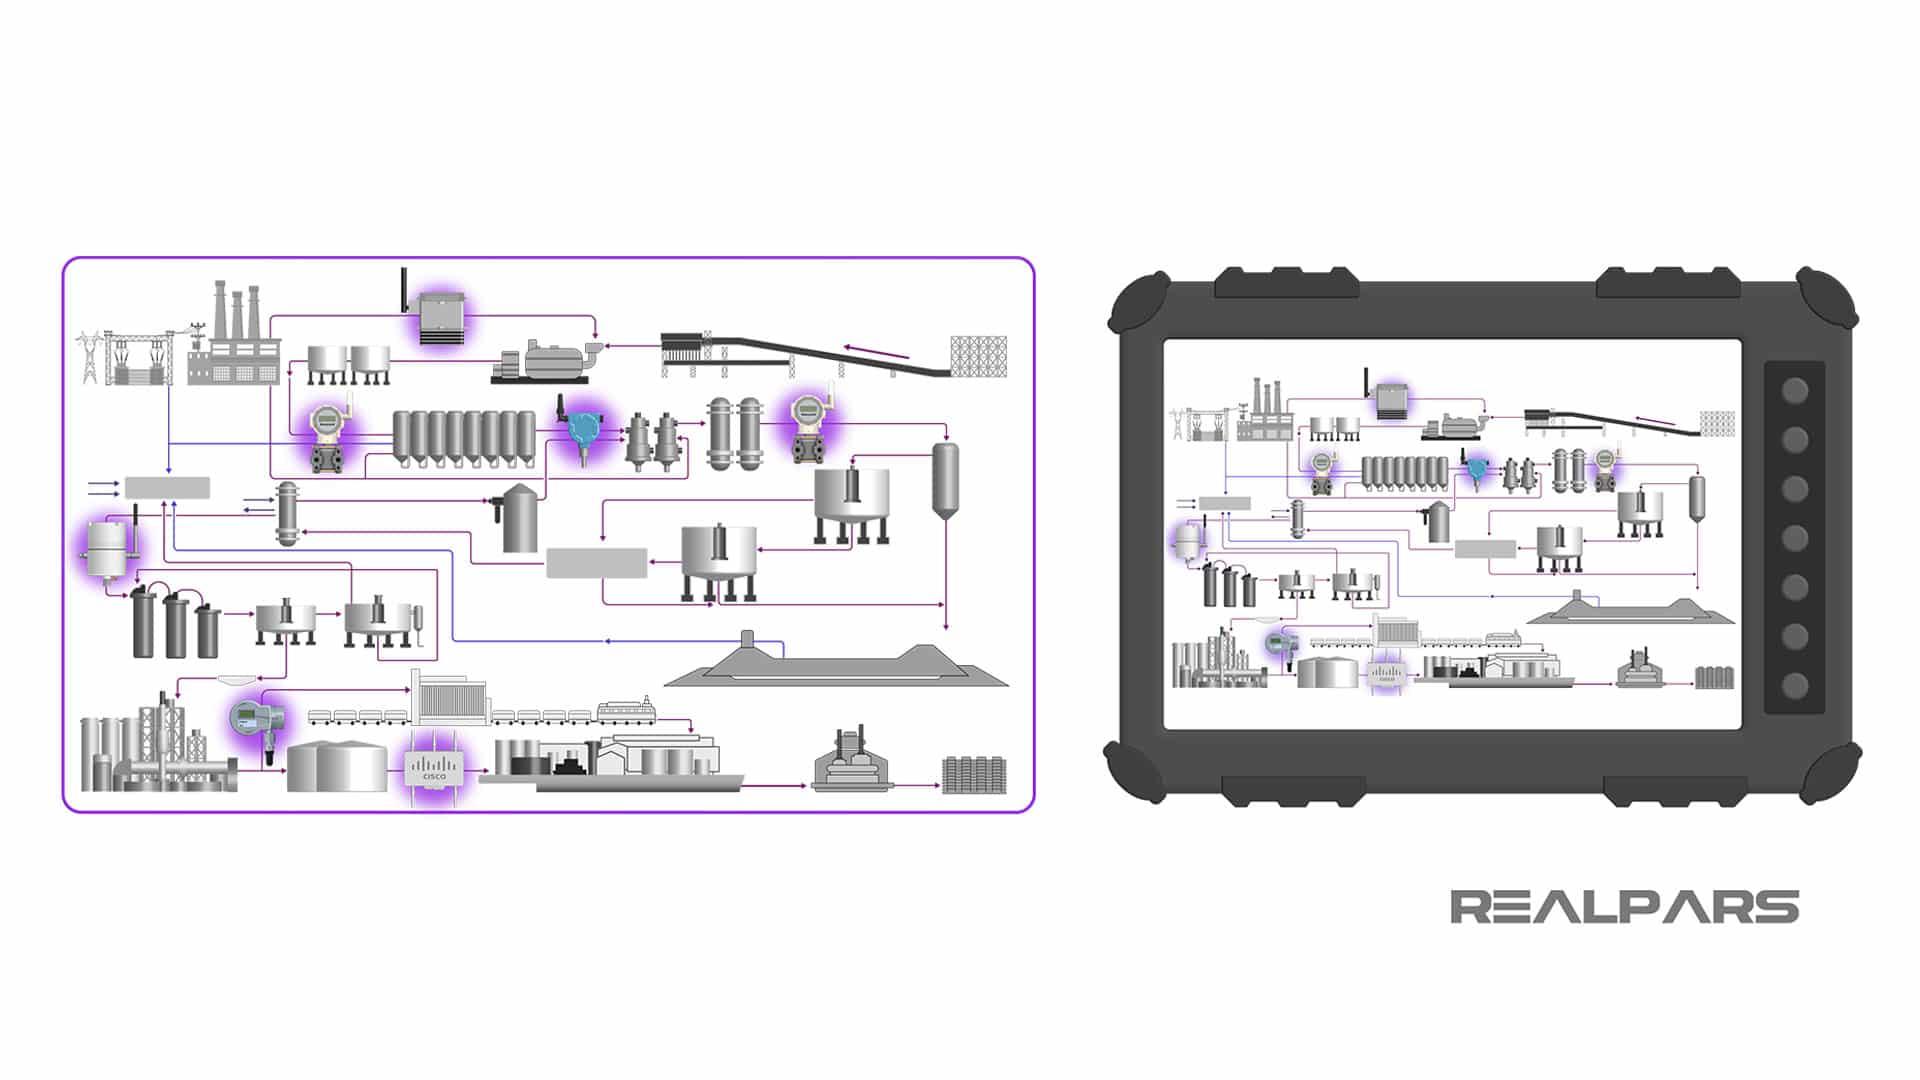 Integration Using ISA100 Wireless